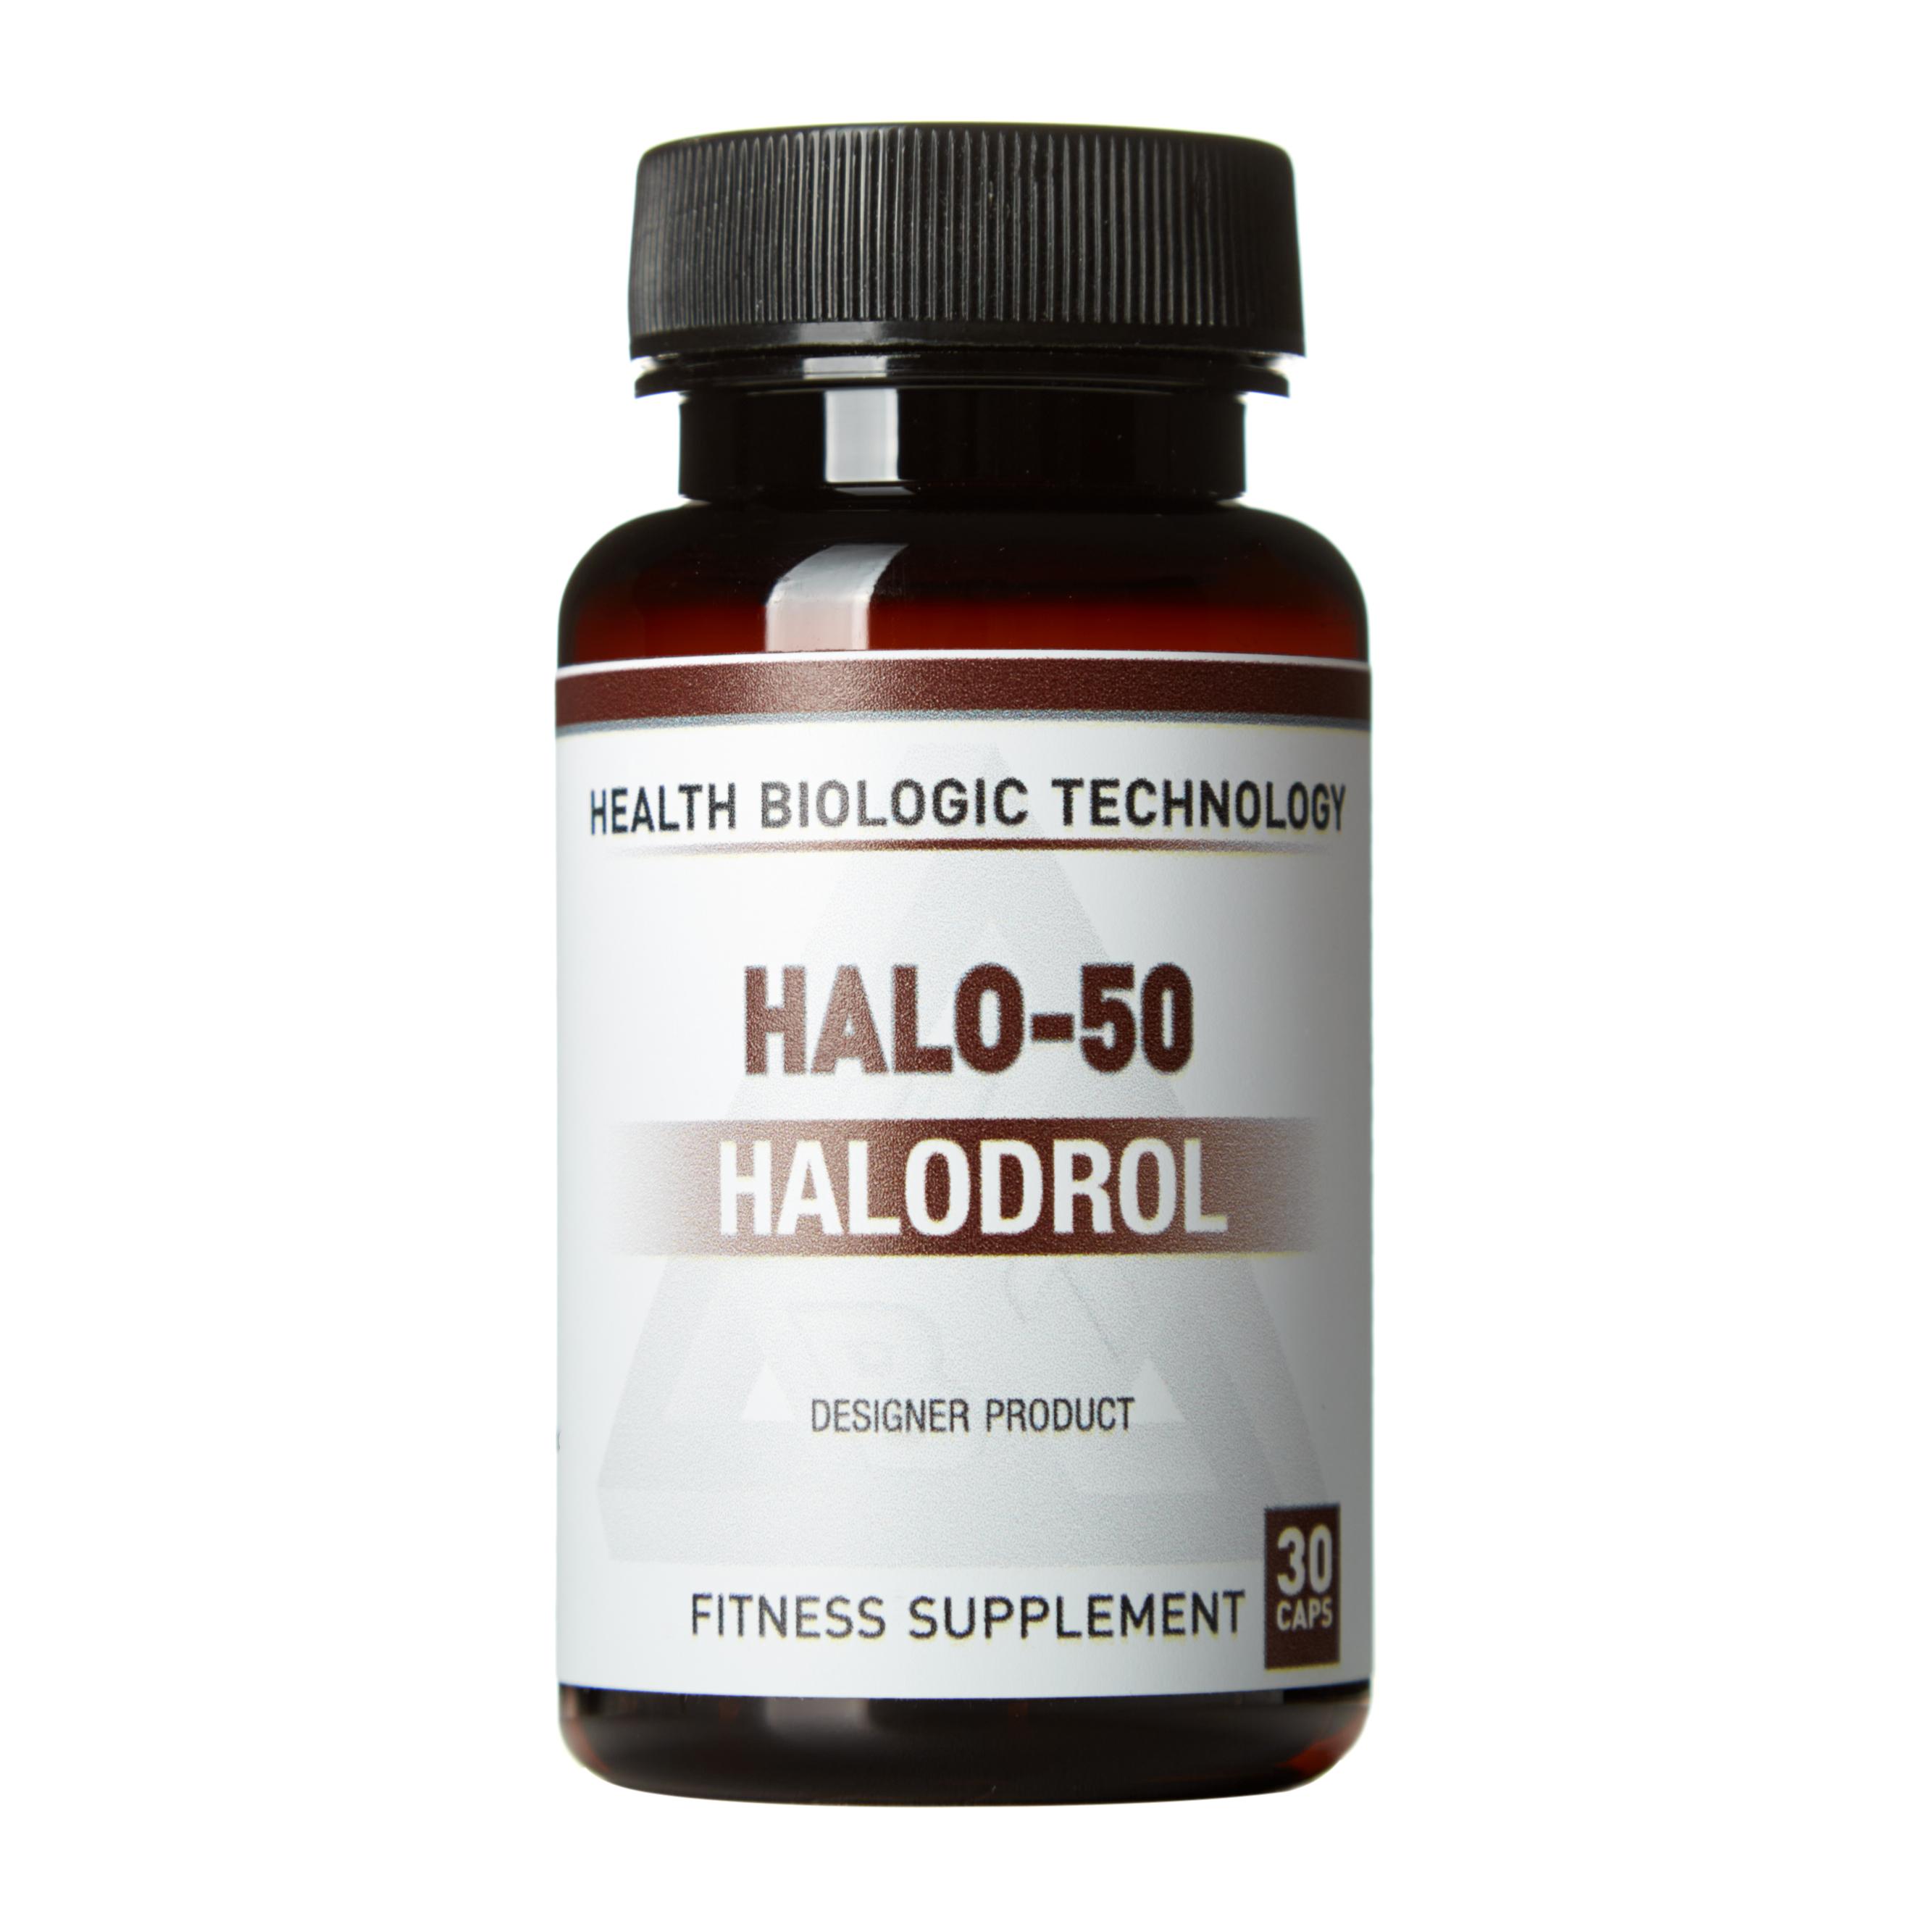 Halo-50 (Halodrol)